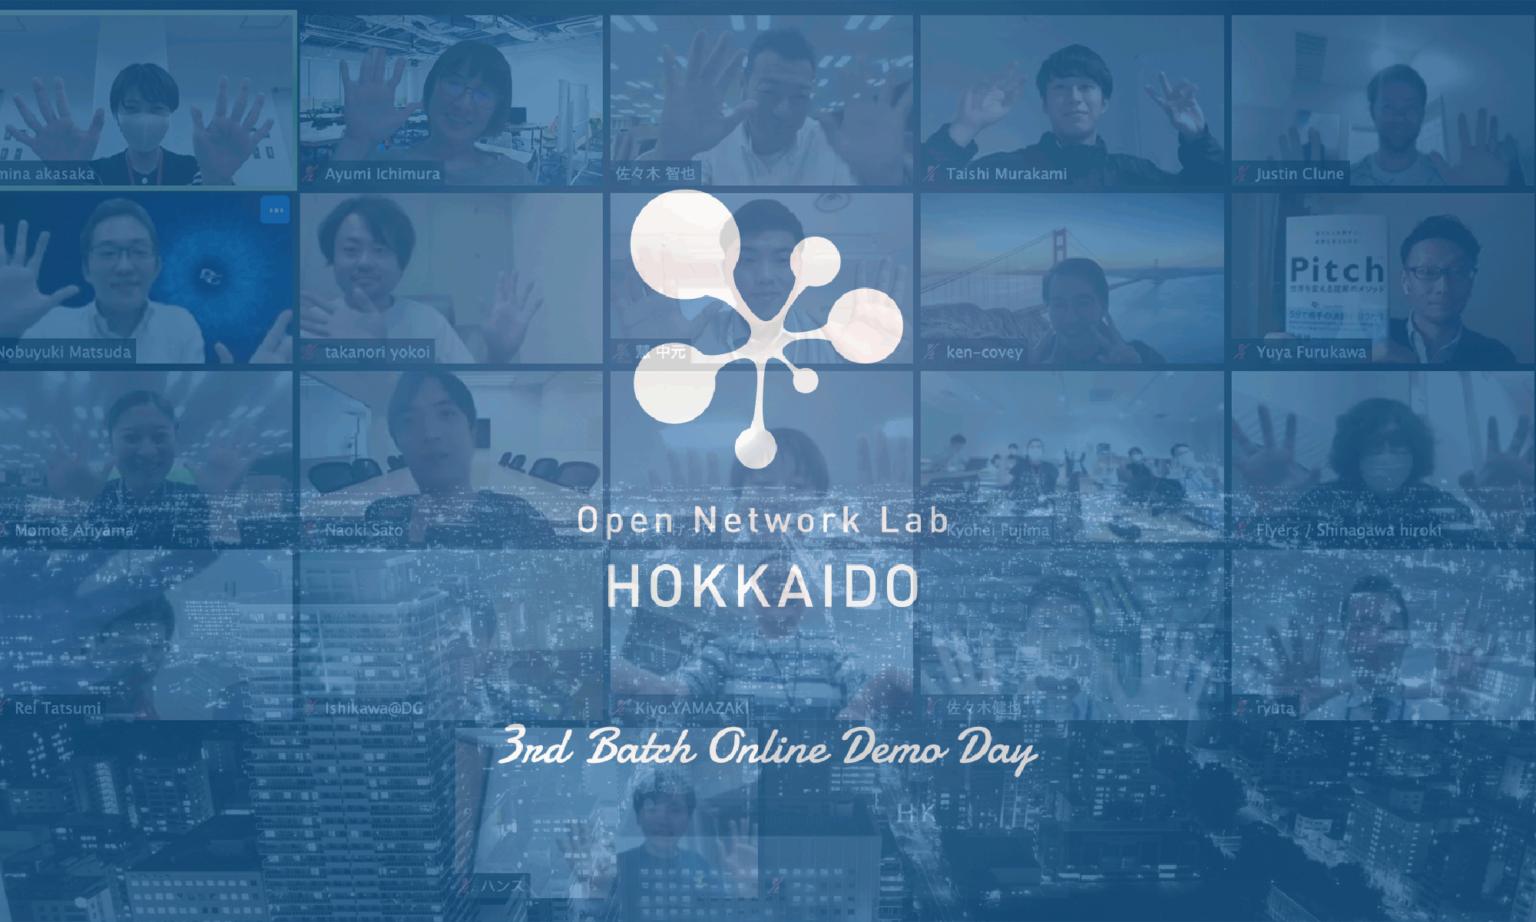 Open Network Lab HOKKAIDO 3rd Batch Online Demo Day report